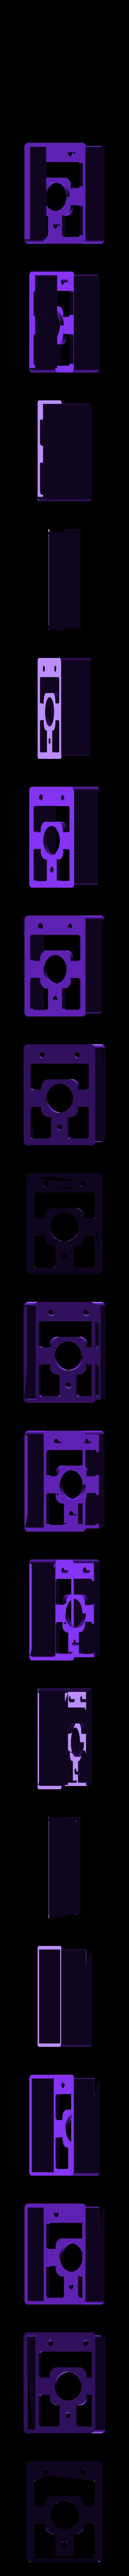 rpb-motor-box.stl Download free STL file Reciprocating Rack and Pinion • 3D printable model, Adafruit